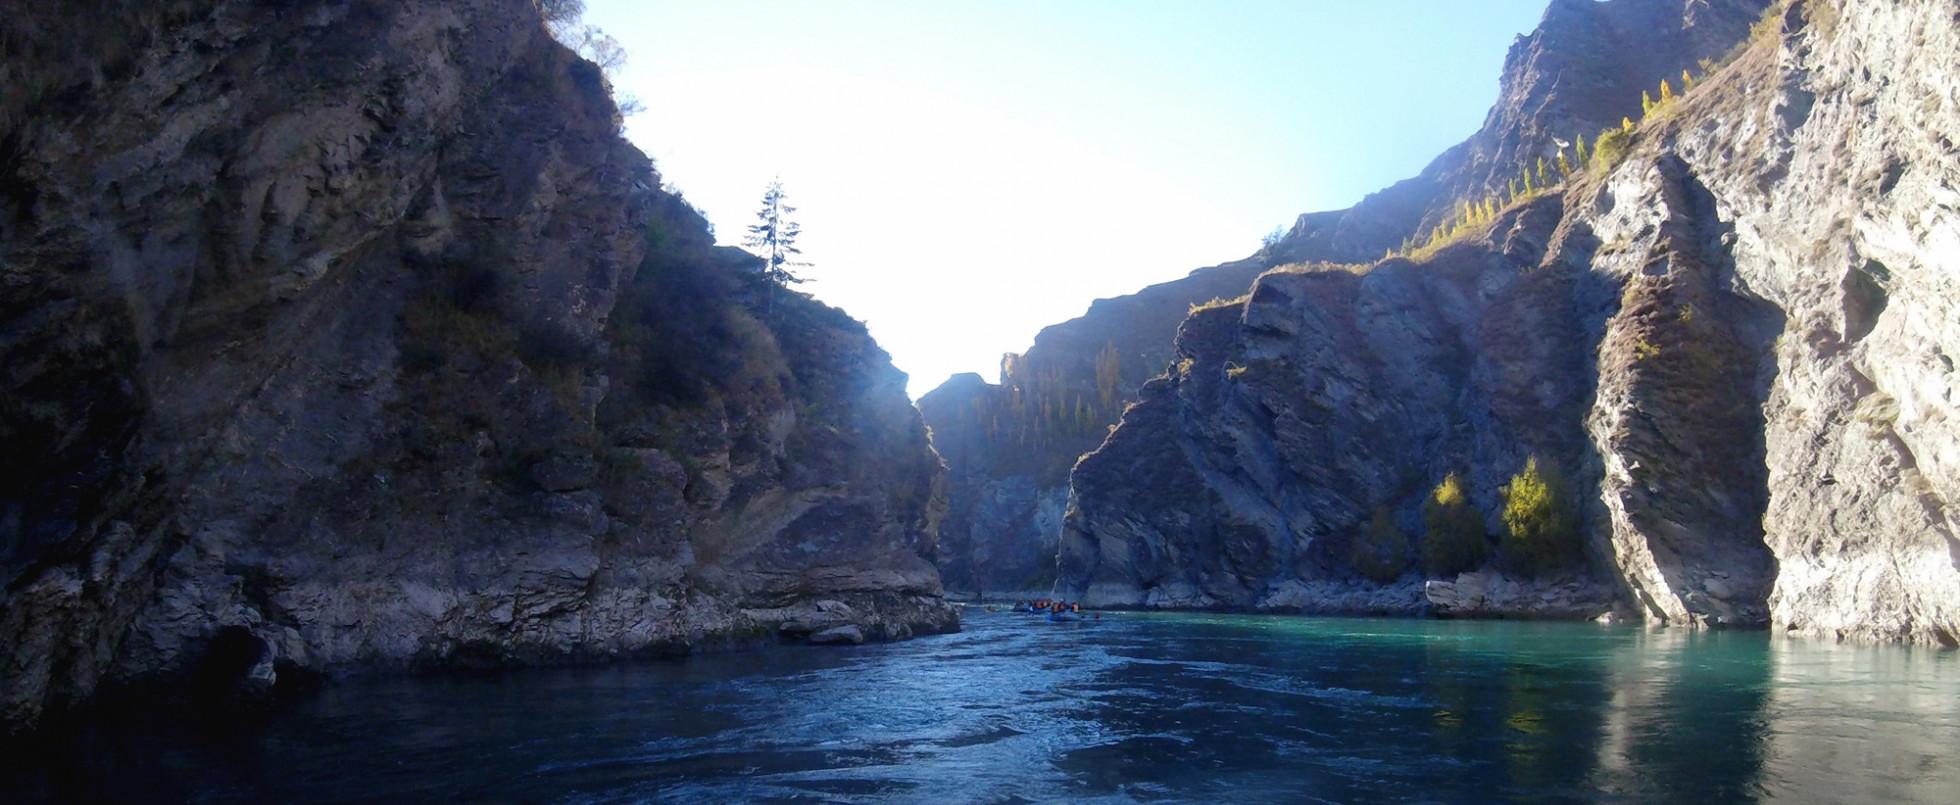 Kawarau Gorge: The Pillars of the Kings